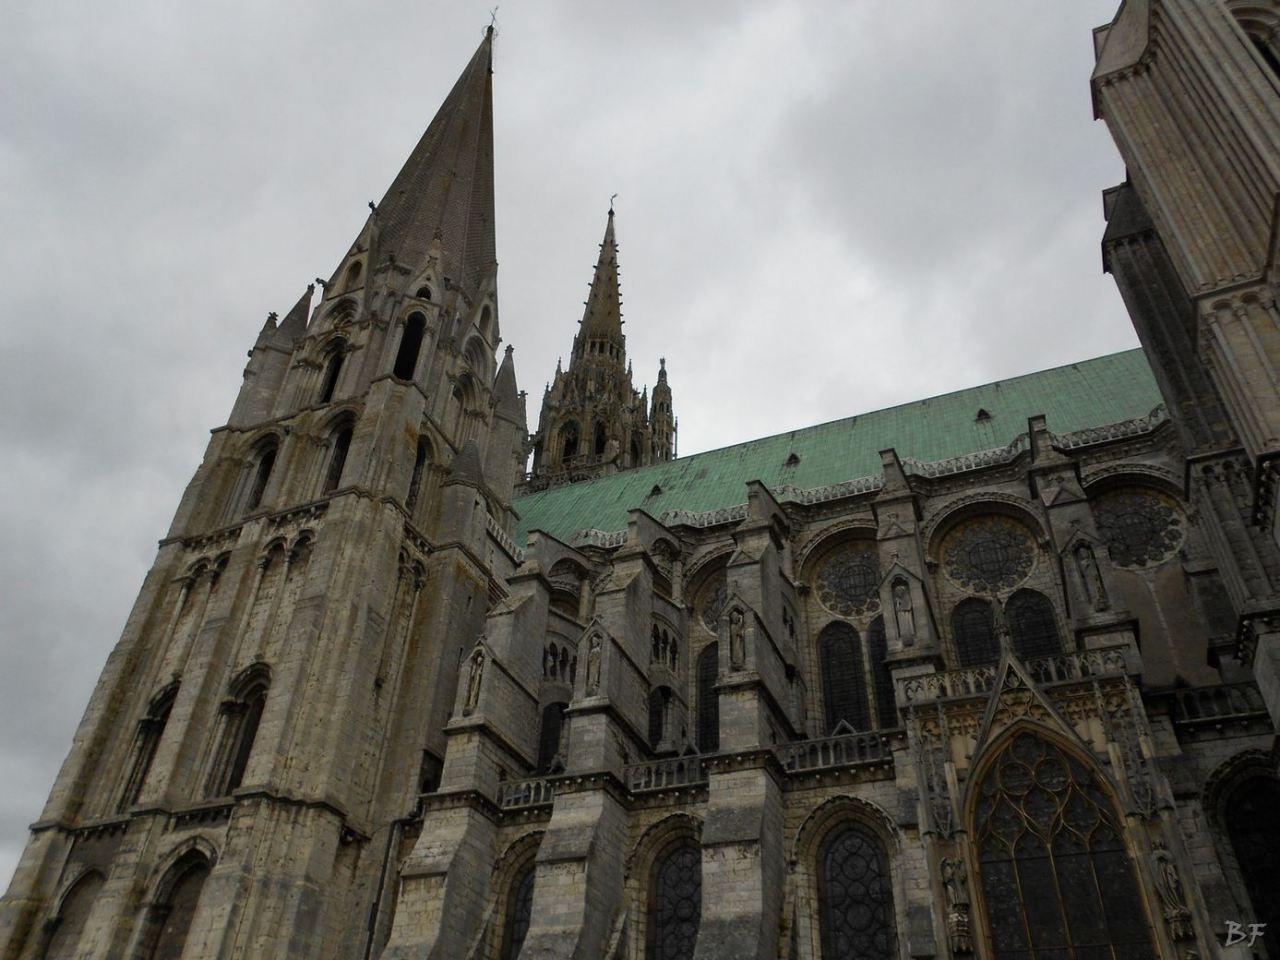 Cattedrale-Gotica-della-Vergine-Chartres-Eure-et-Loir-Centre-Val-de-Loire-Francia-8